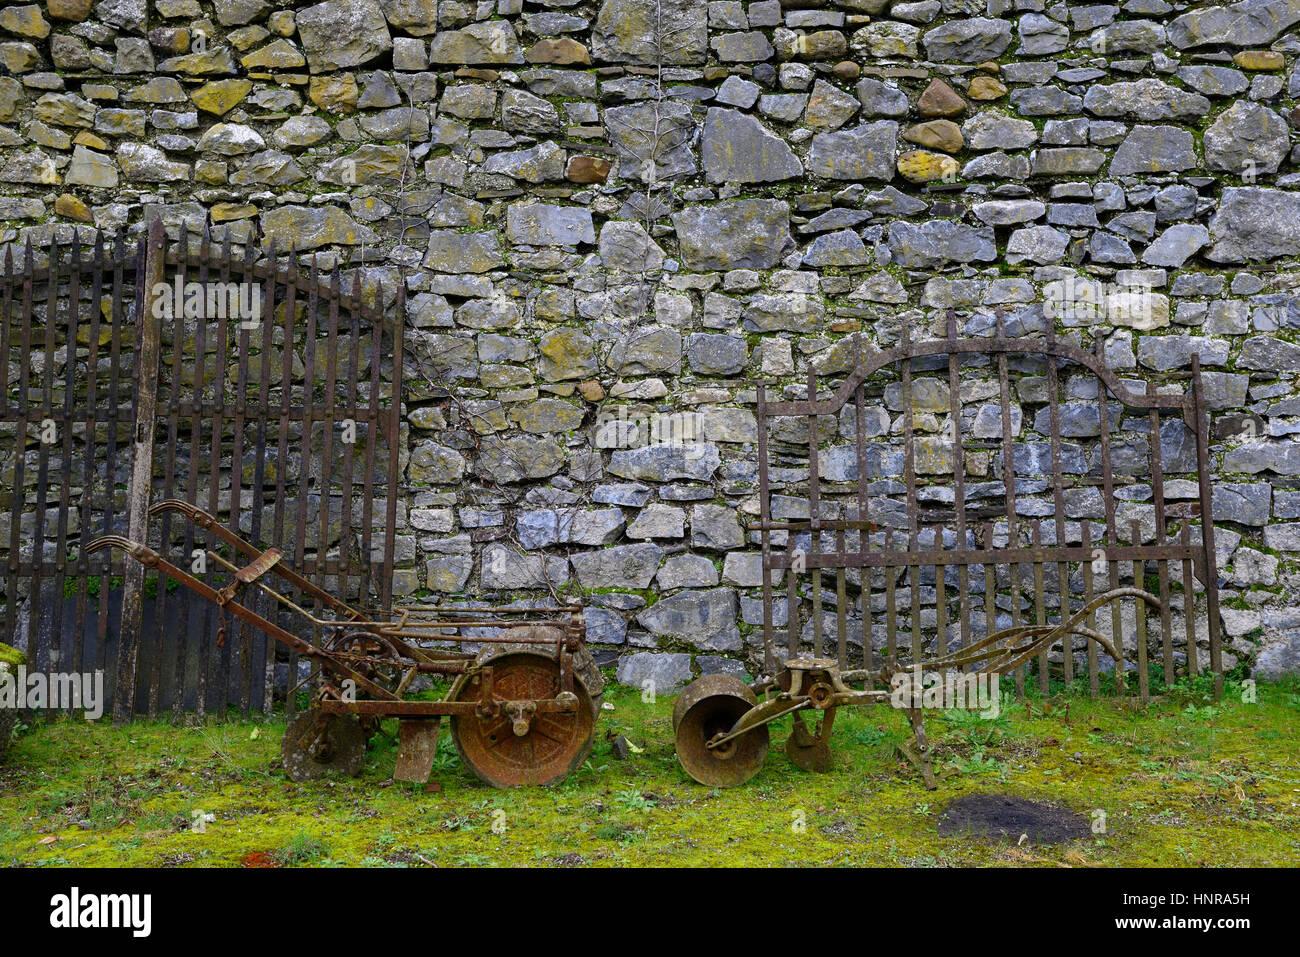 agricultural salvage, old, plough, ploughs, gate, gates, junk, secondhand, garden, feature, antique, sale, RM Floral - Stock Image